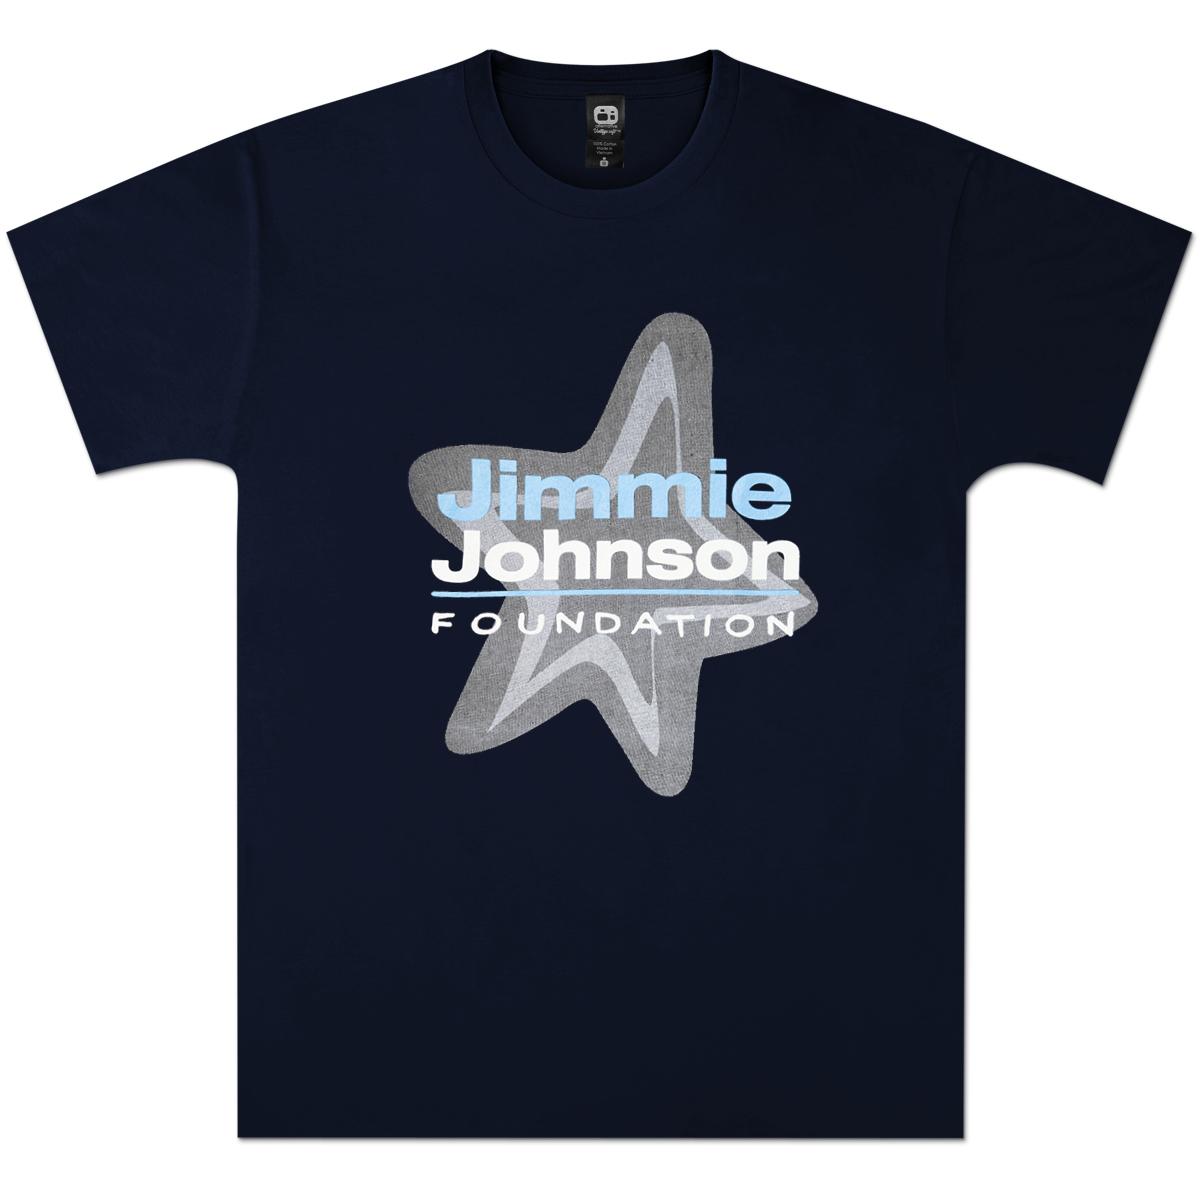 Jimmie Johnson Foundation Navy T-Shirt